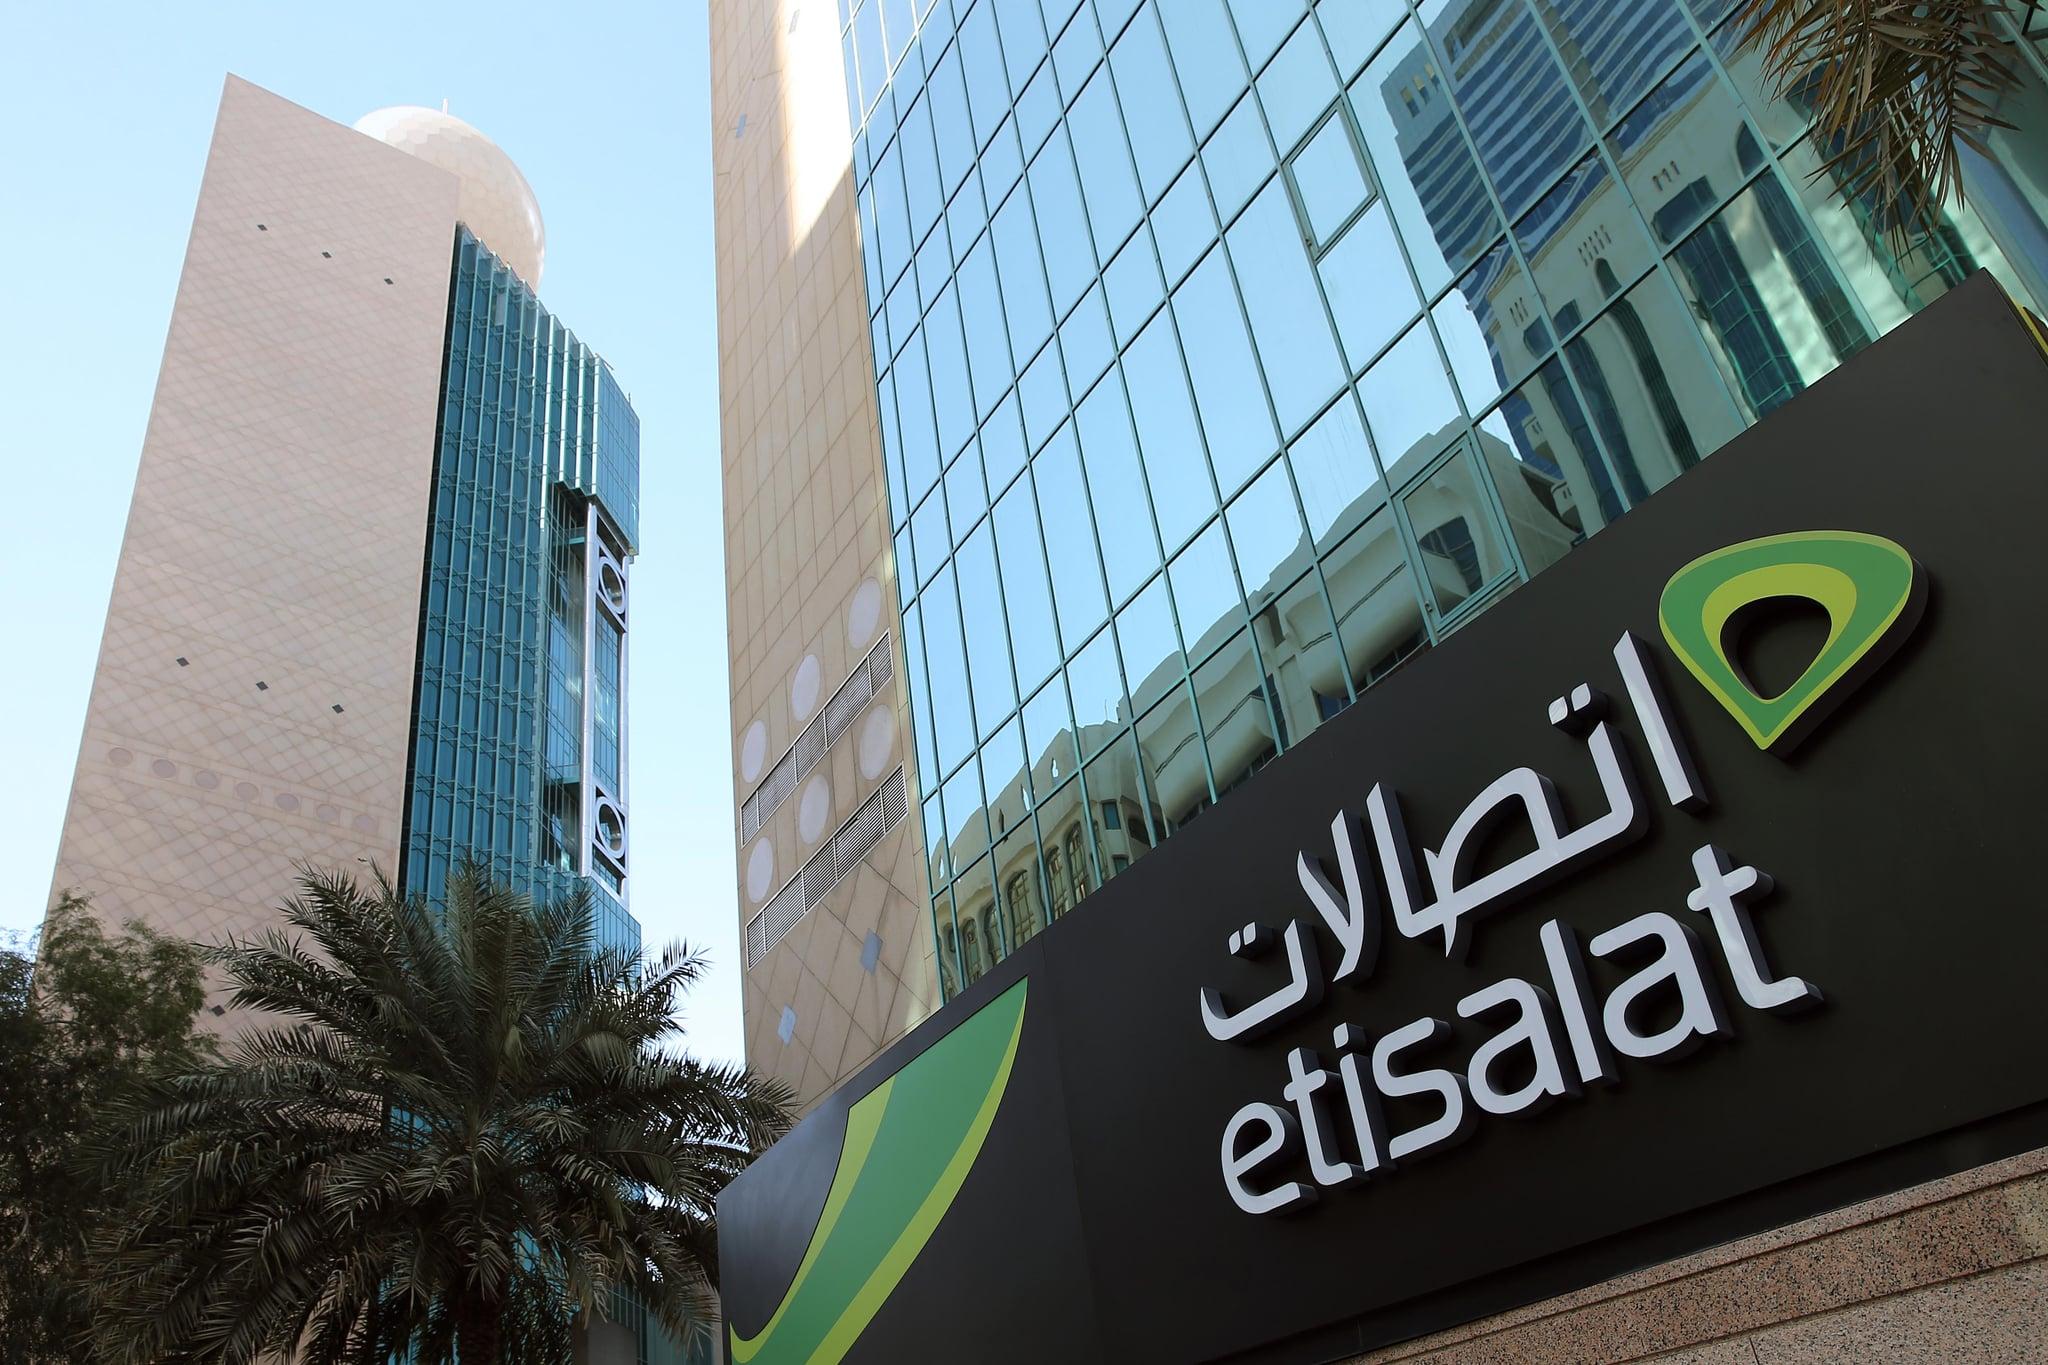 Etisalat Launches Internet Calling Plan